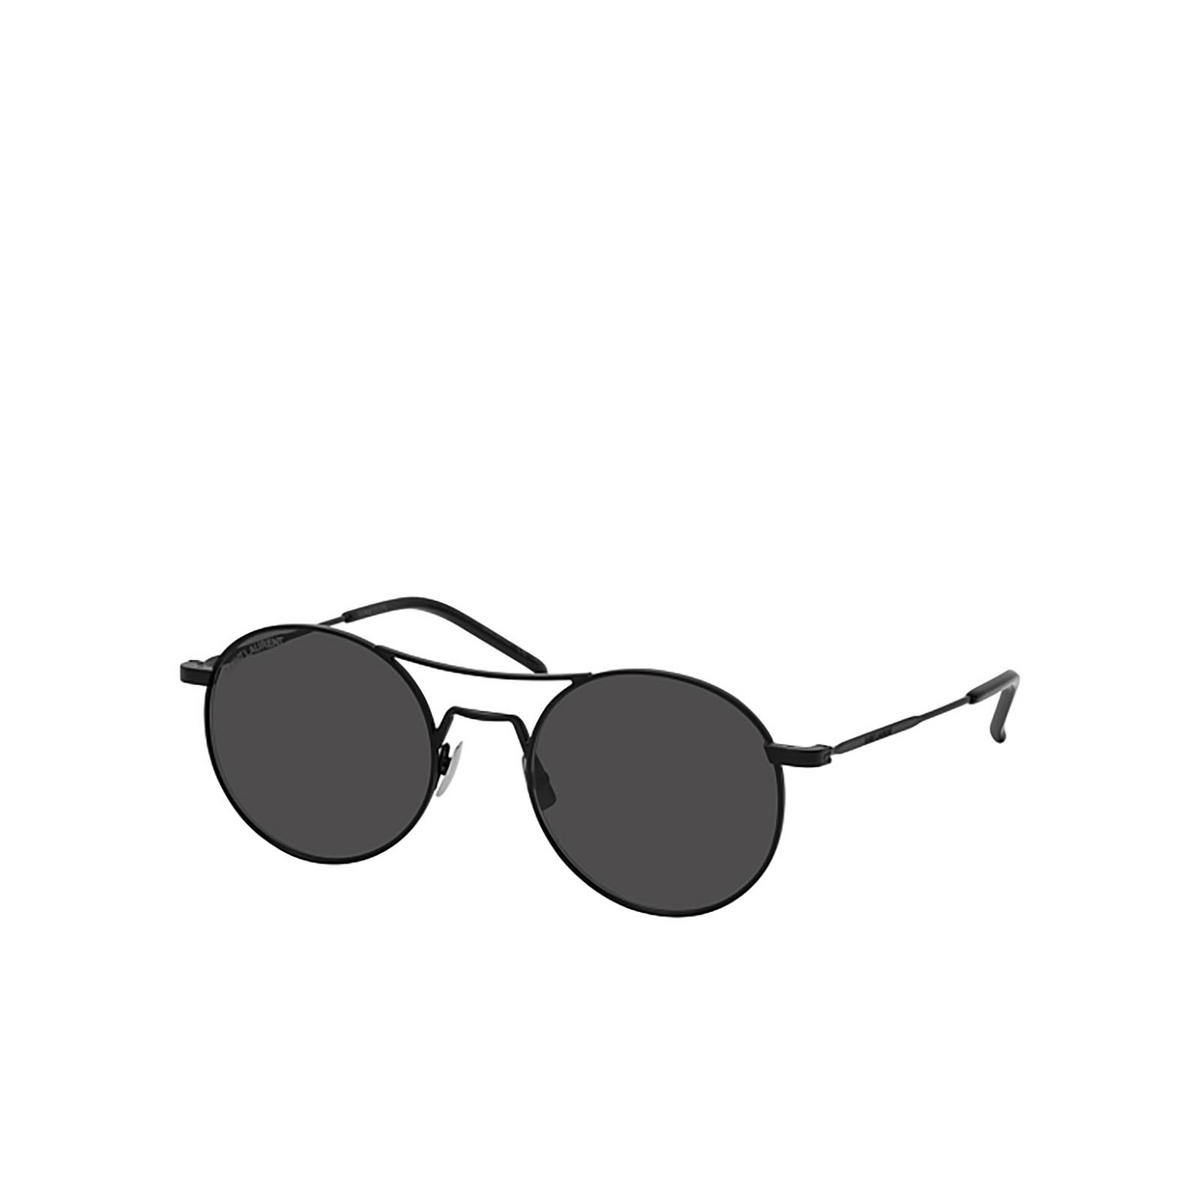 Saint Laurent® Round Sunglasses: SL 421 color Black 001 - three-quarters view.